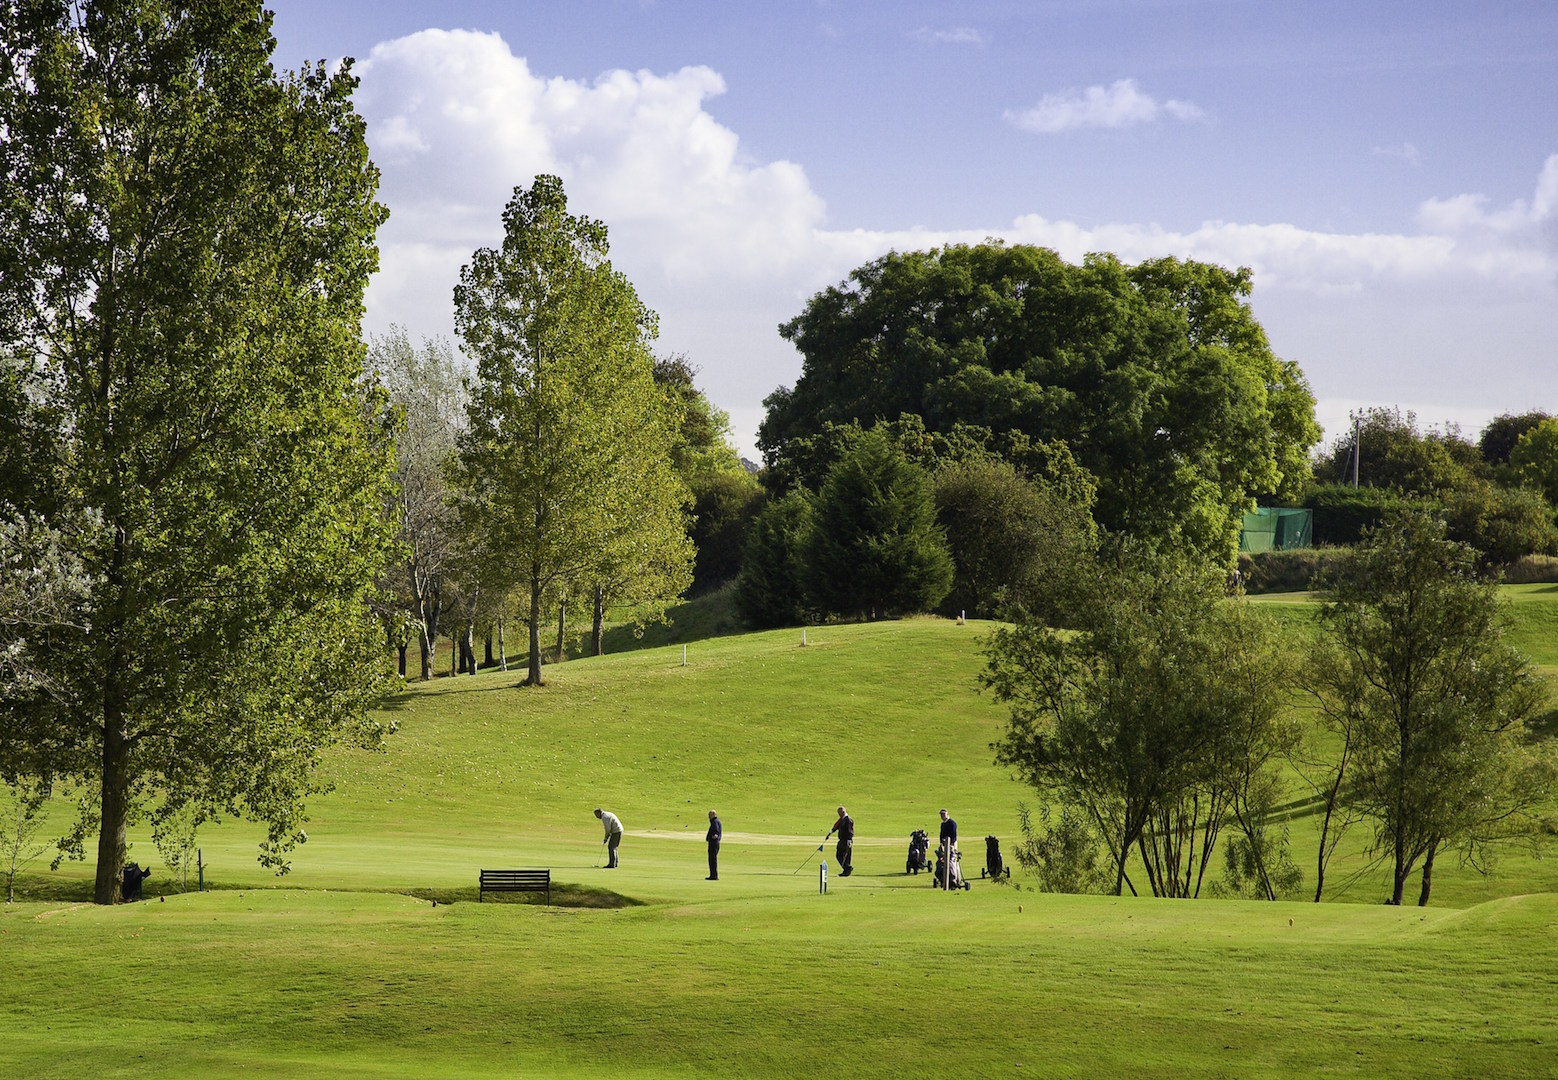 Police scrambled as gun shots fired at Welsh golf club